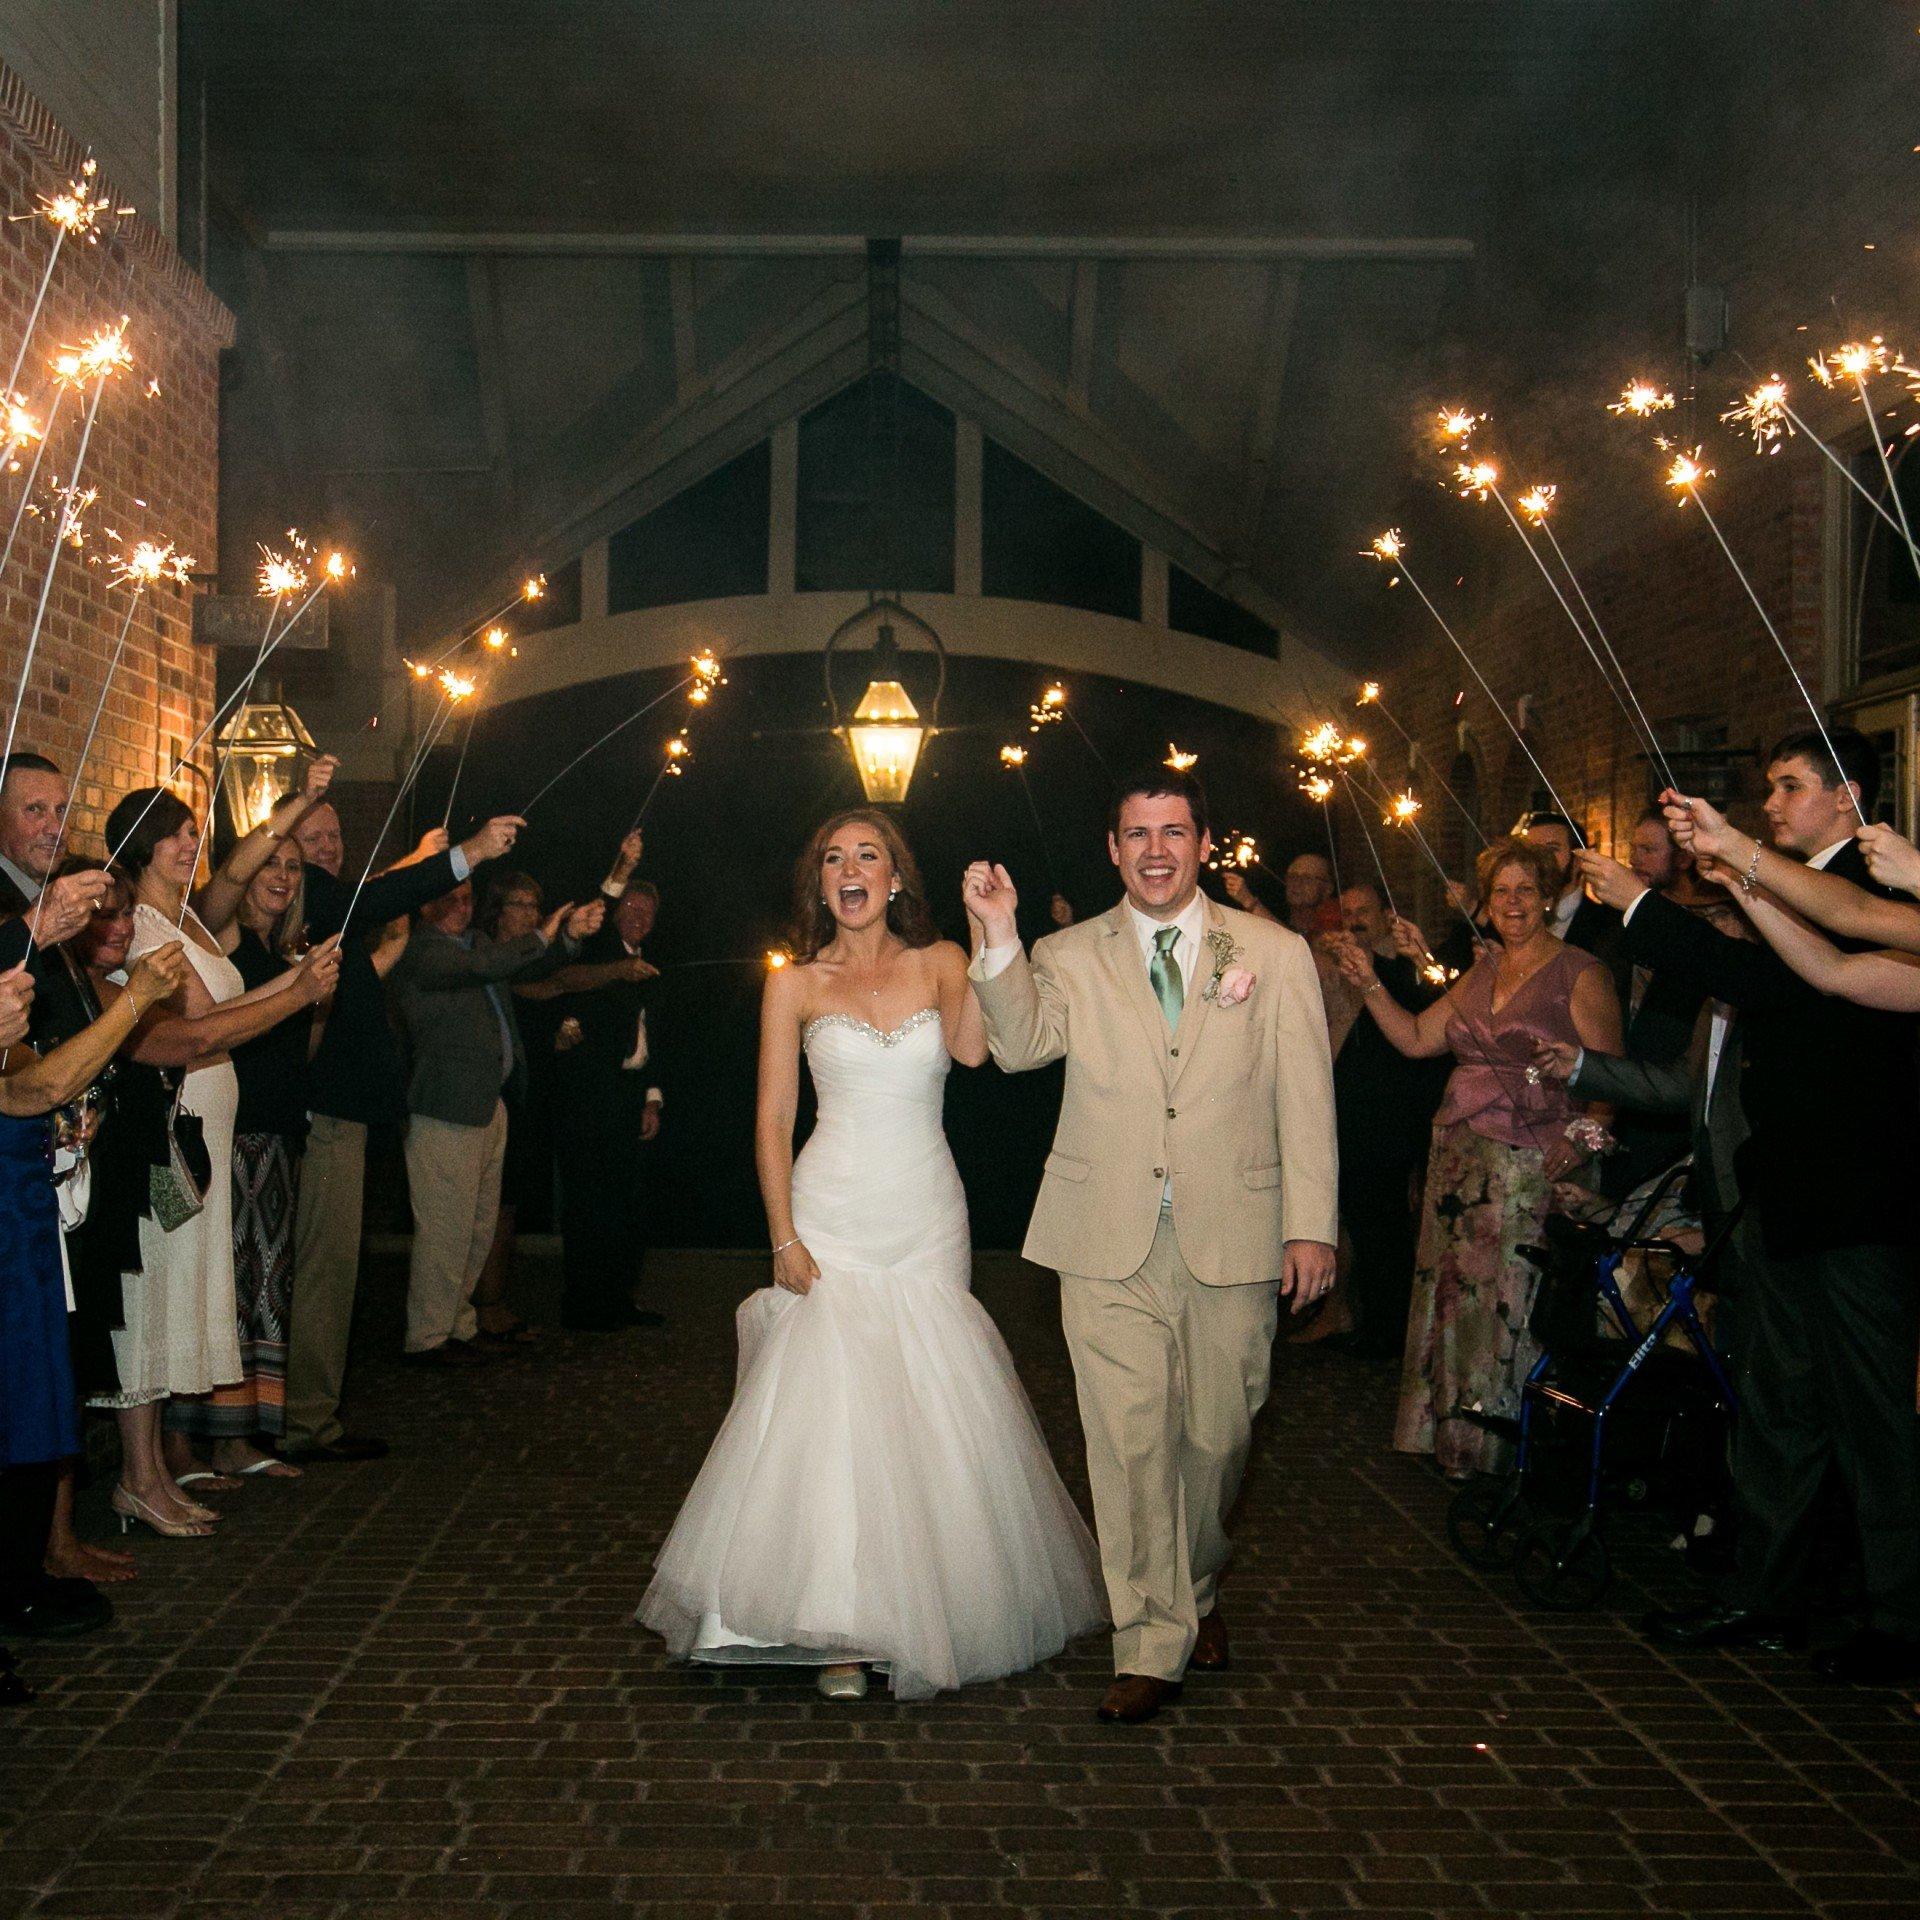 Wedding Venues In Stamford Ct